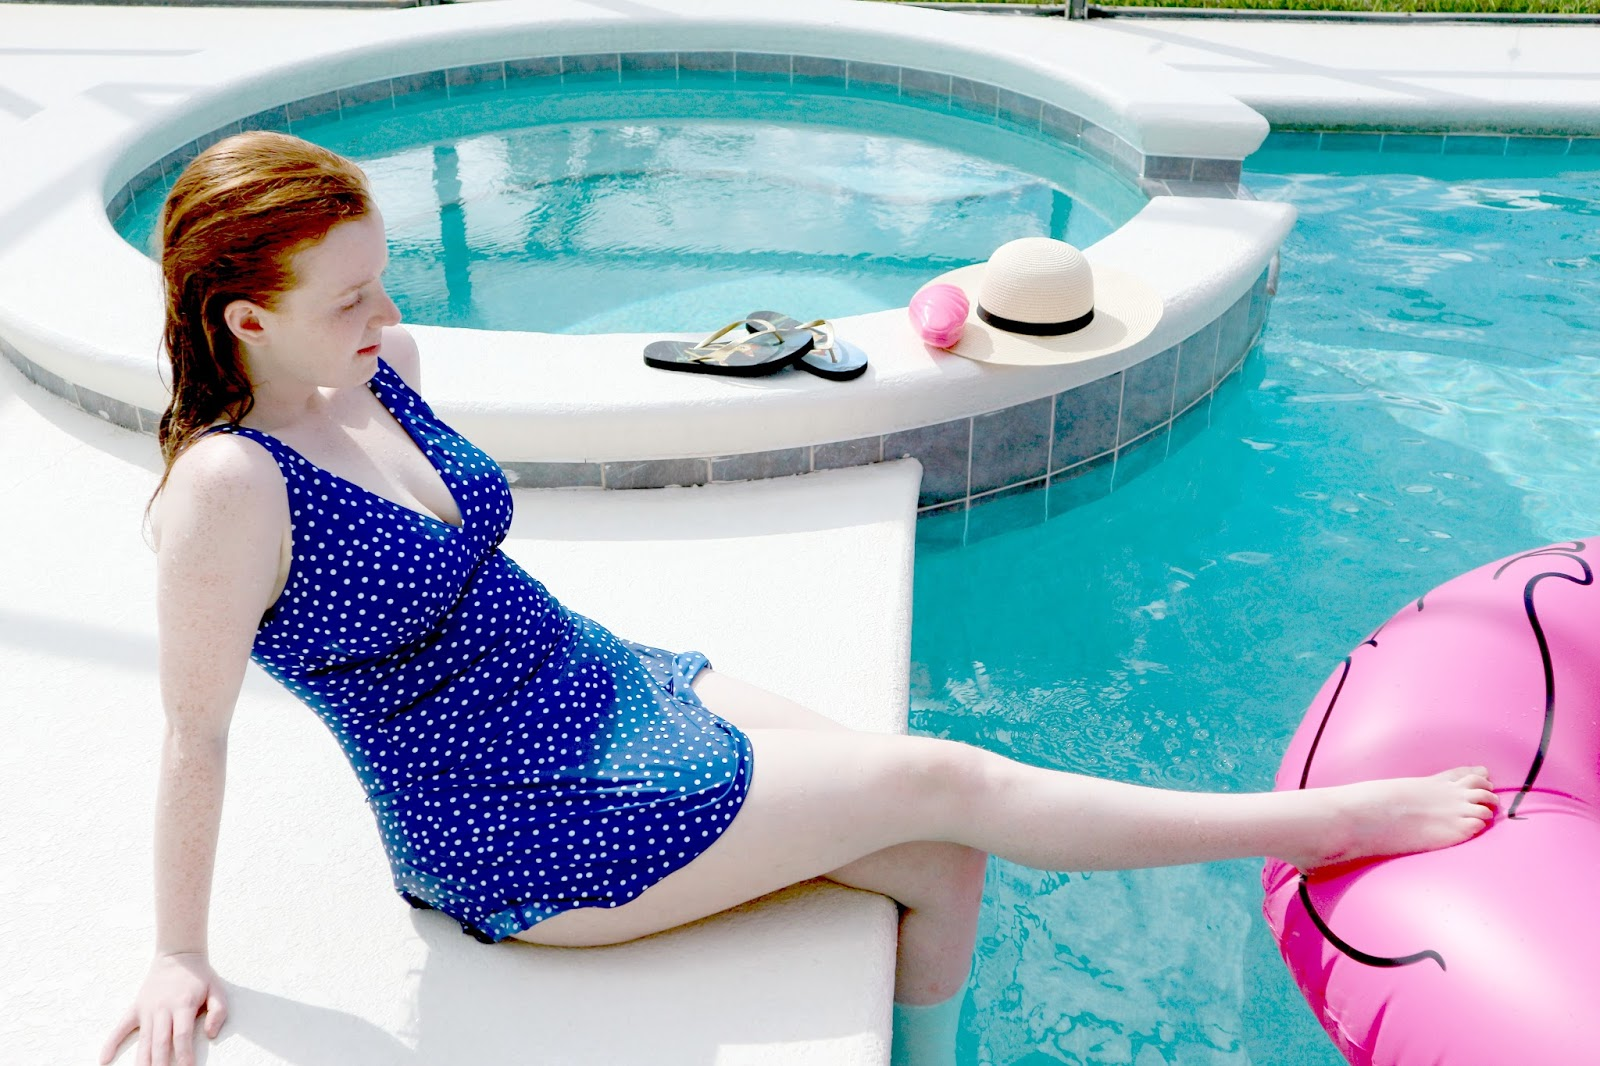 How to feel confident in swimwear